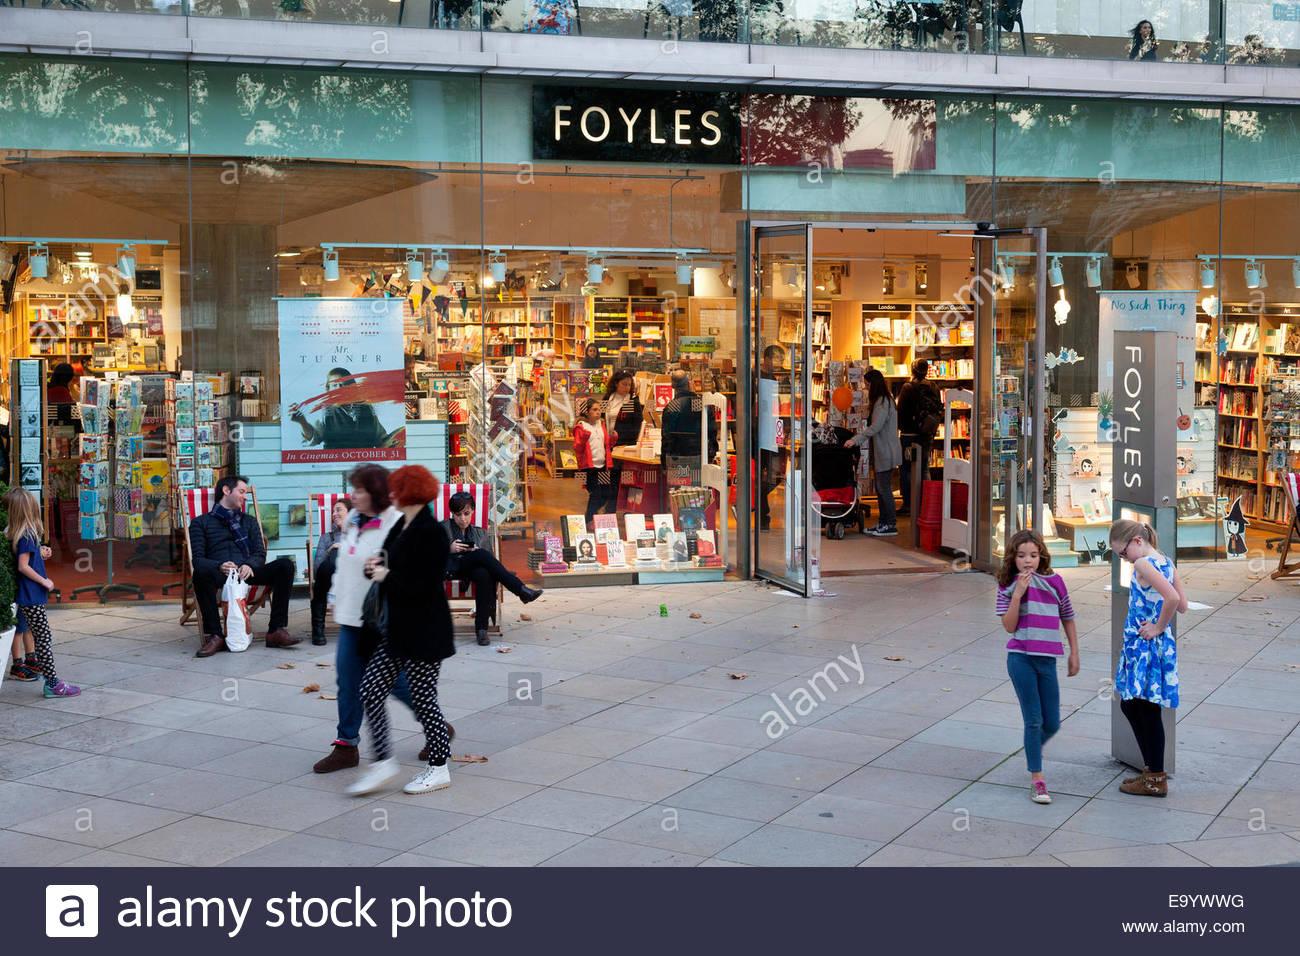 foyles-bookshop-in-the-southbank-centre-south-bank-london-E9YWWG.jpg